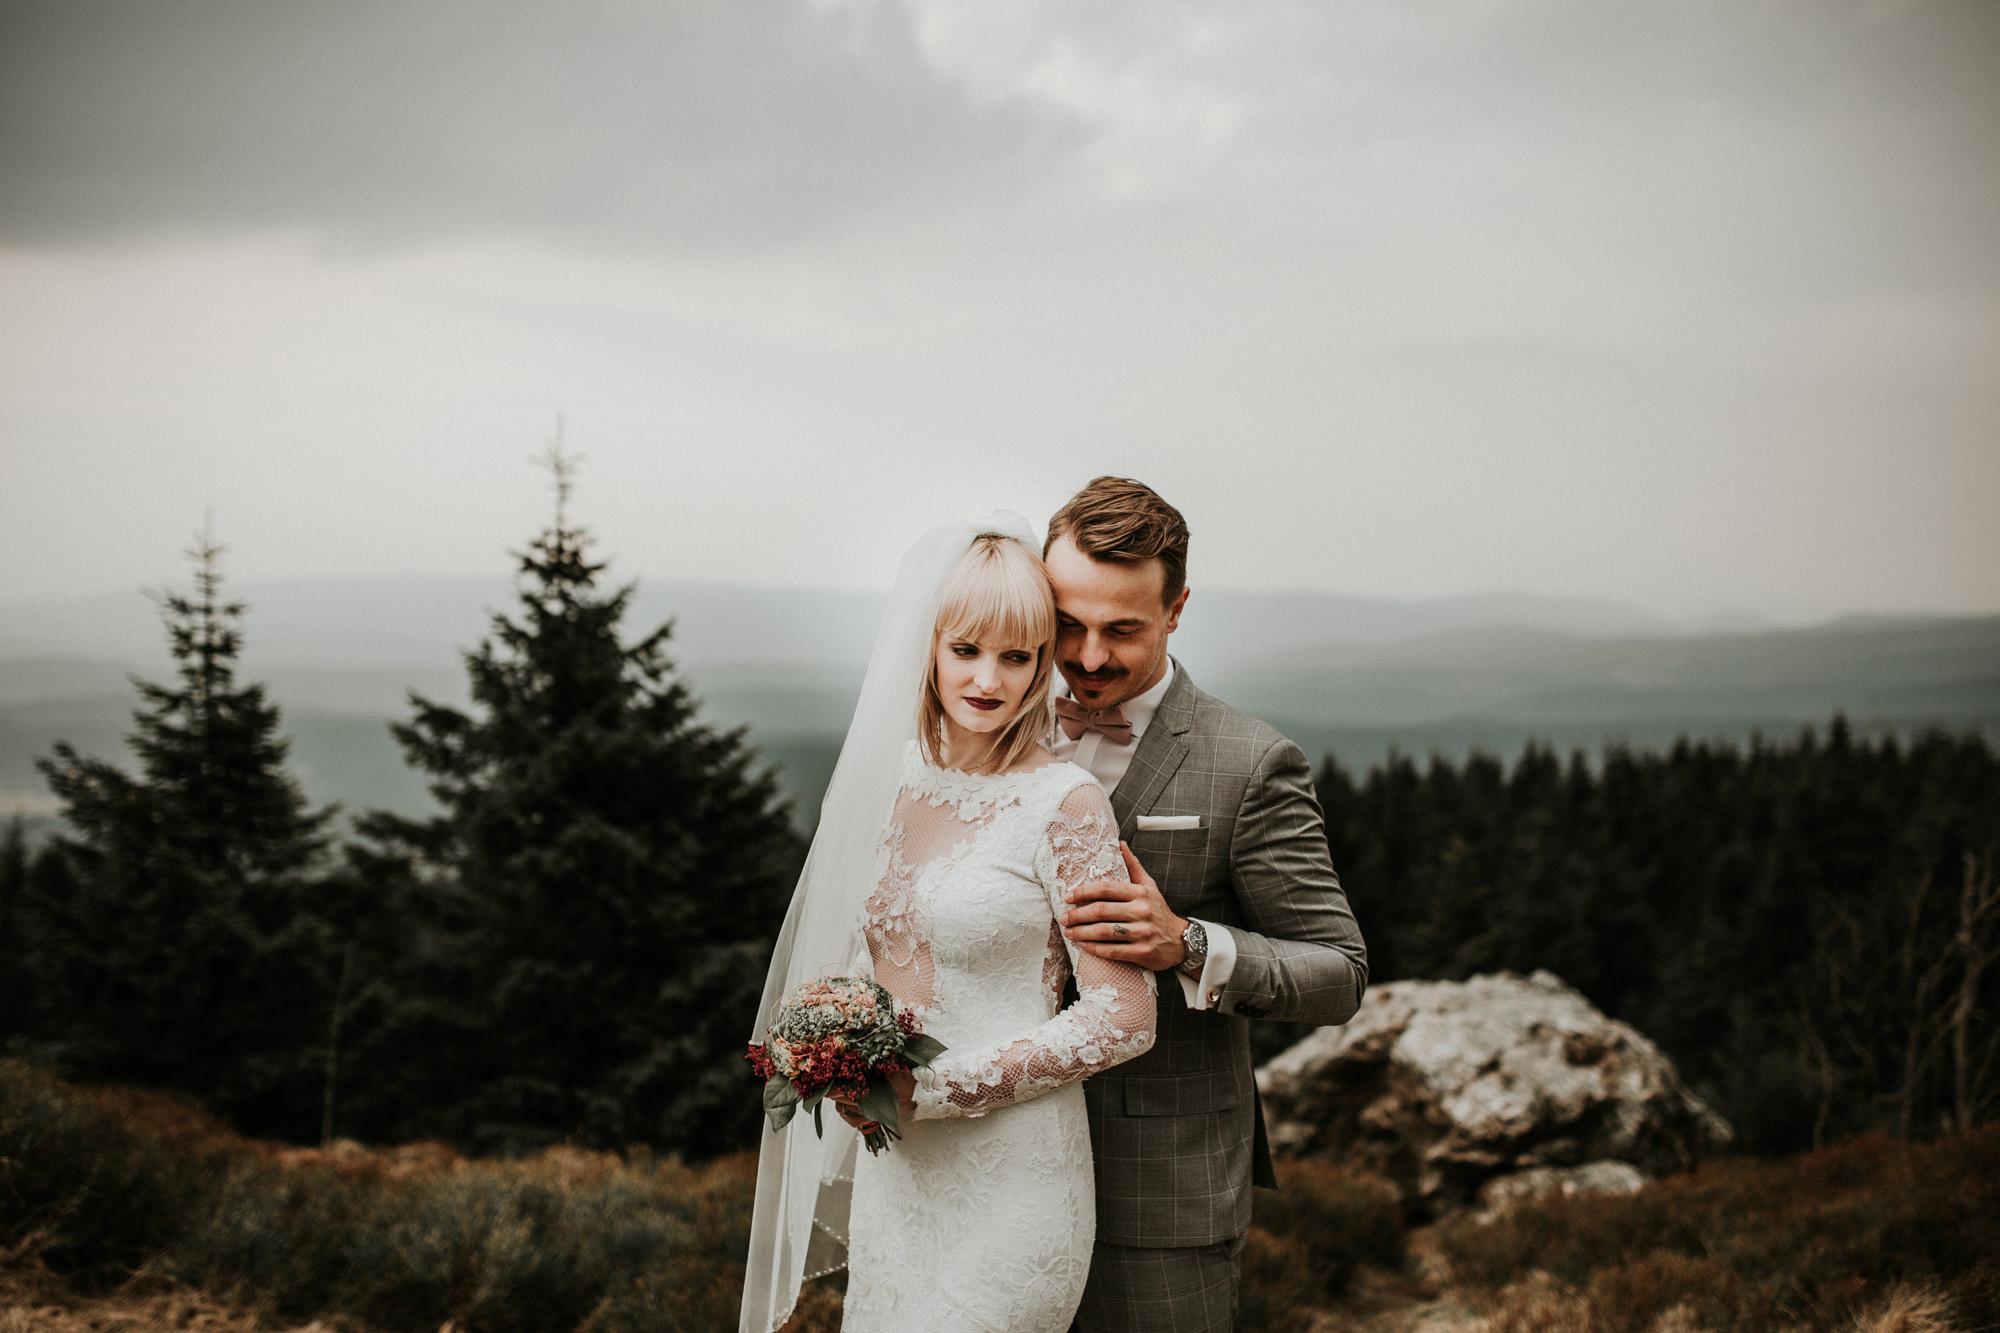 DanielaMarquardtPhotography_Hochzeitsfotograf_Düsseldorf_Köln_Mallorca_Bayern_Austria_Harz_LinaundMaik_Afterwedding-Shooting_Weddingphotographer_Ibiza_Tuskany_Italien_Toskana84